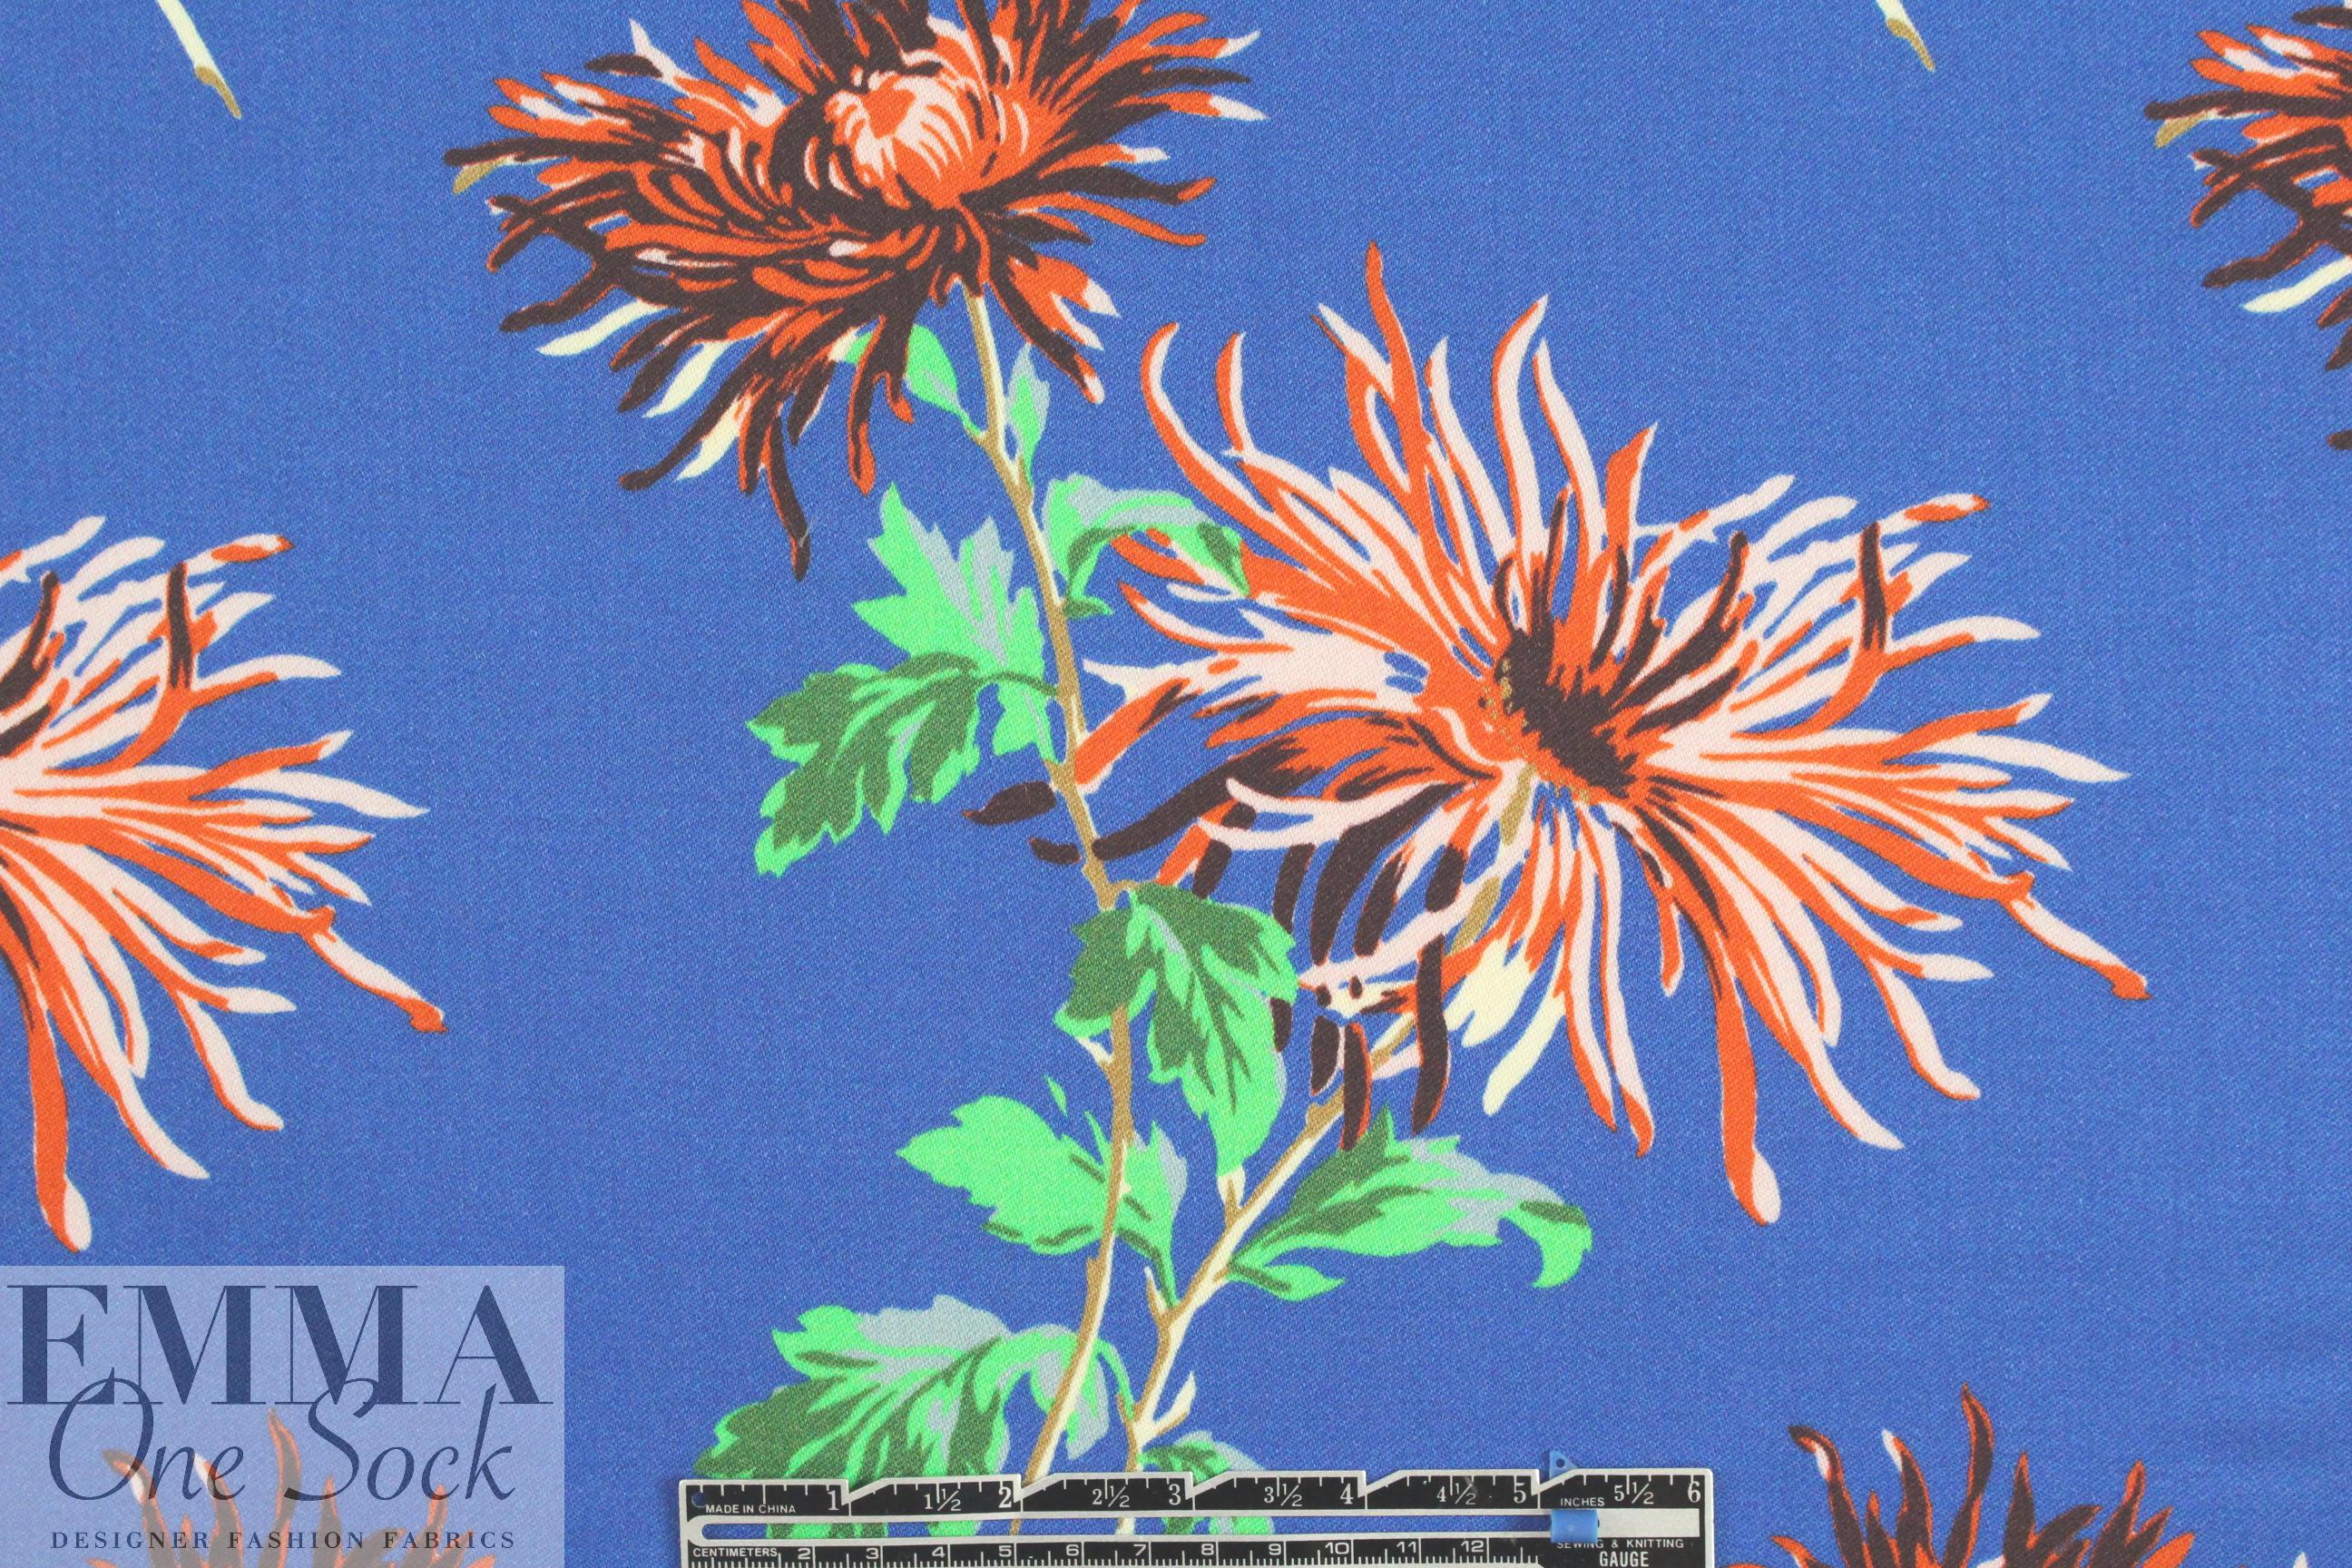 Famouse Designer Flowers On Blue Woolsilk Woven From Emmaonesock